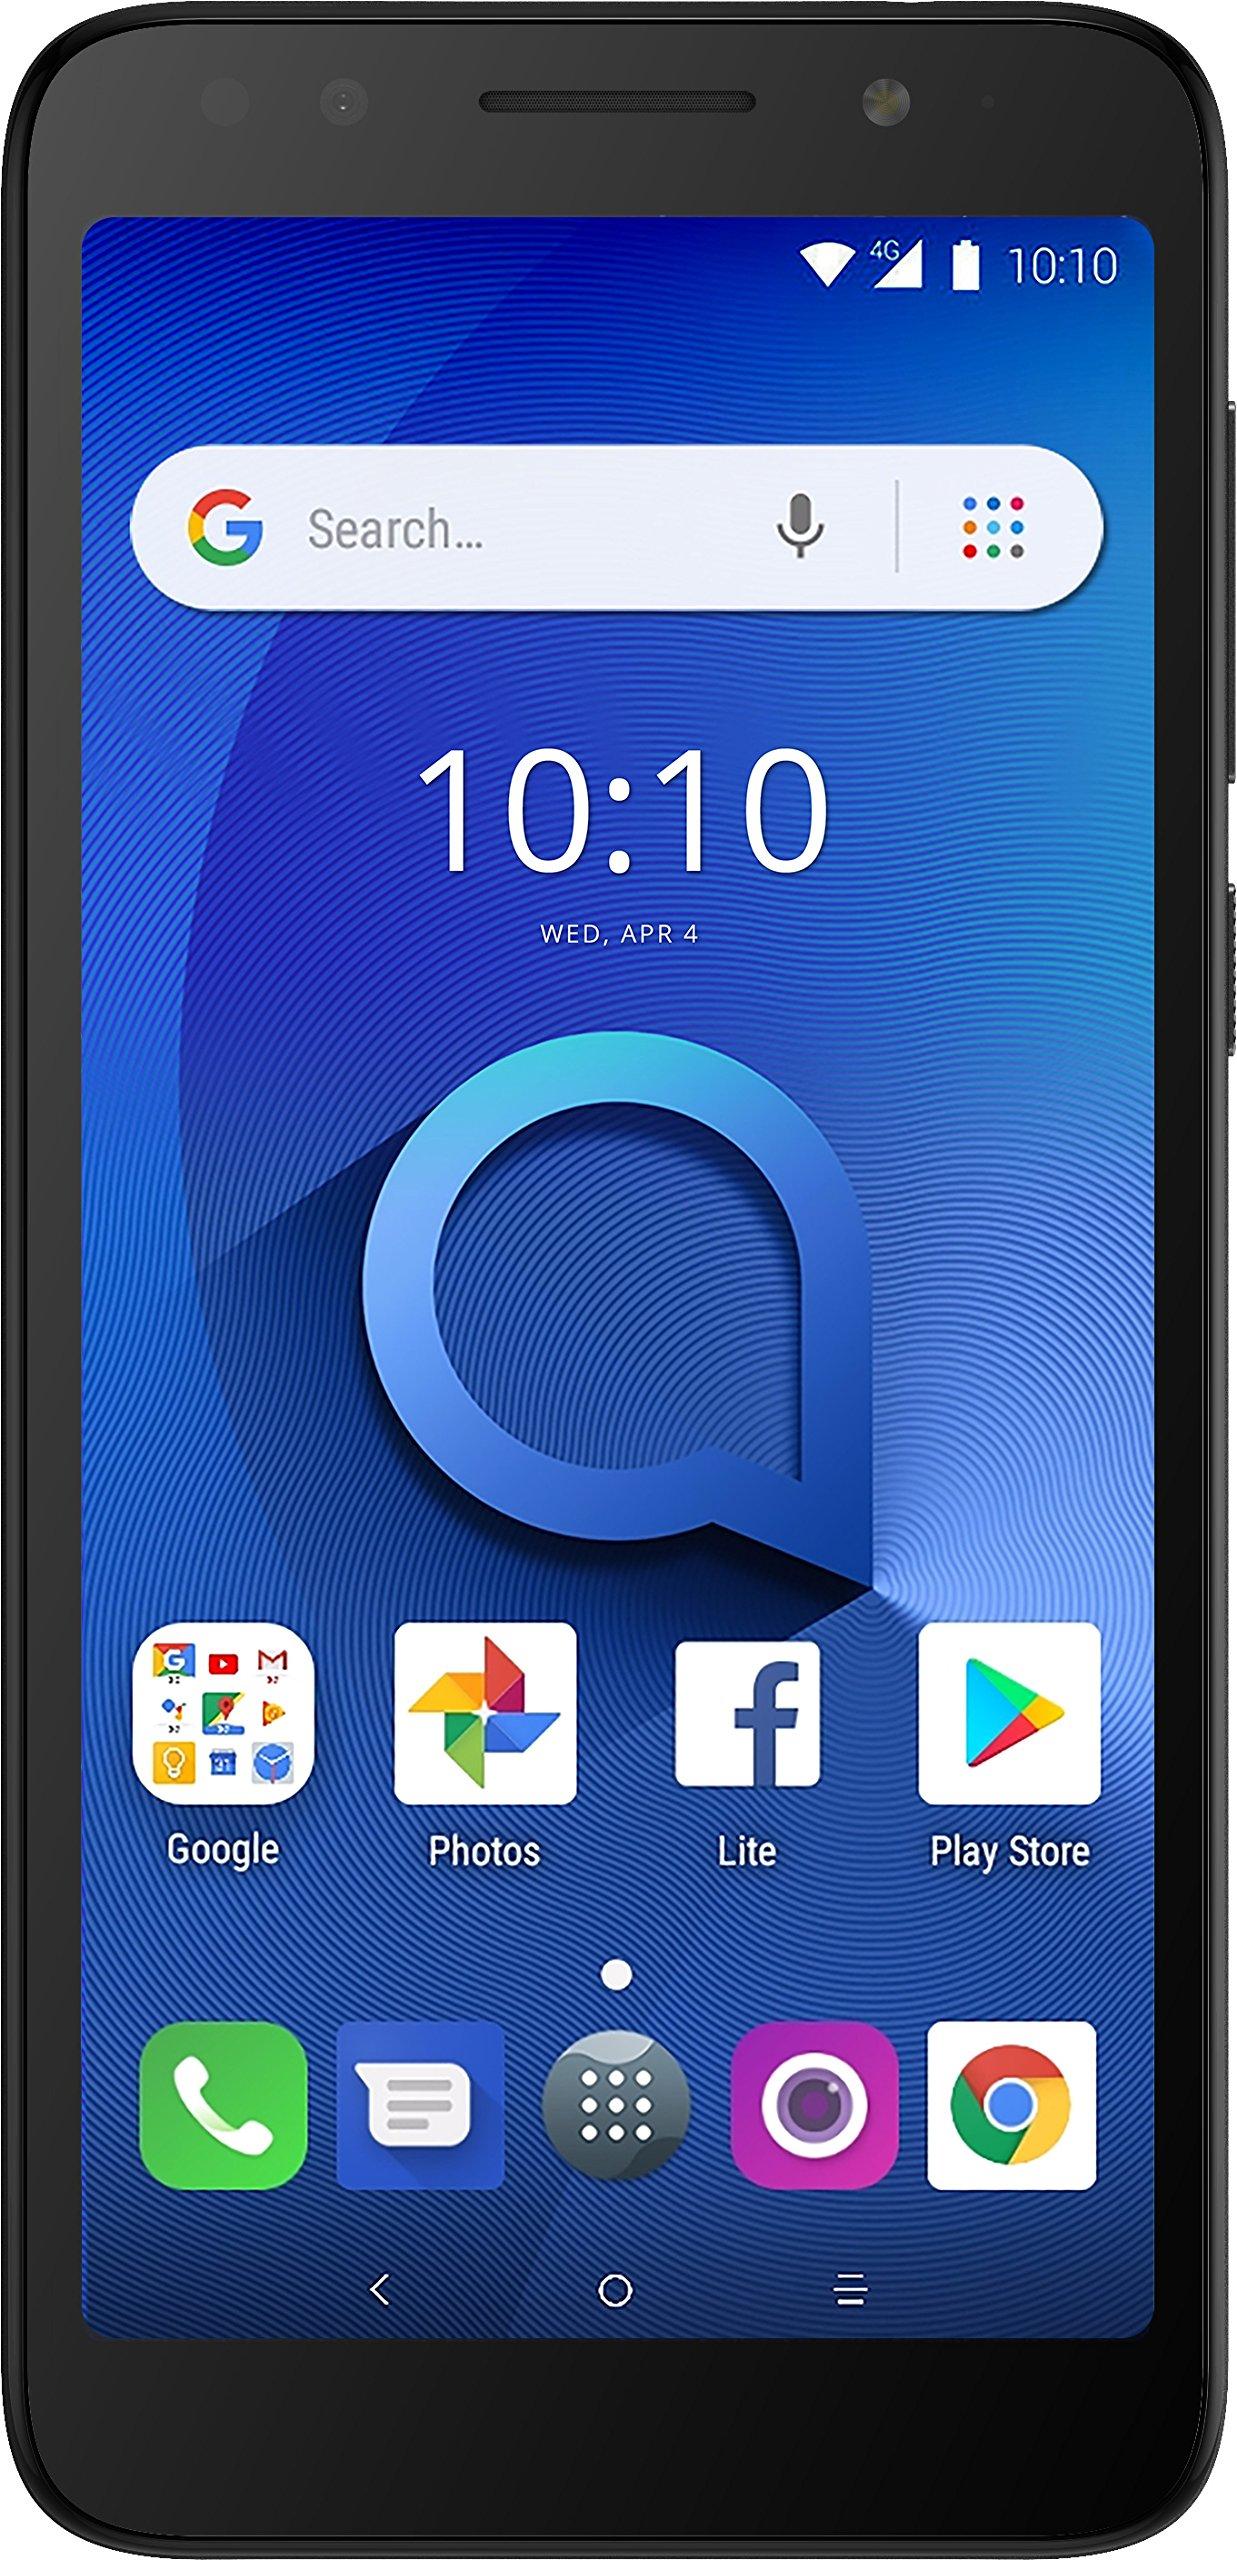 Alcatel 1X Unlocked Smartphone (AT&T/T-Mobile) - 5.3'' 18:9 Display, Android Oreo (Go Edition), 8MP Rear Camera, 4G LTE - Dark Gray (U.S. Warranty)